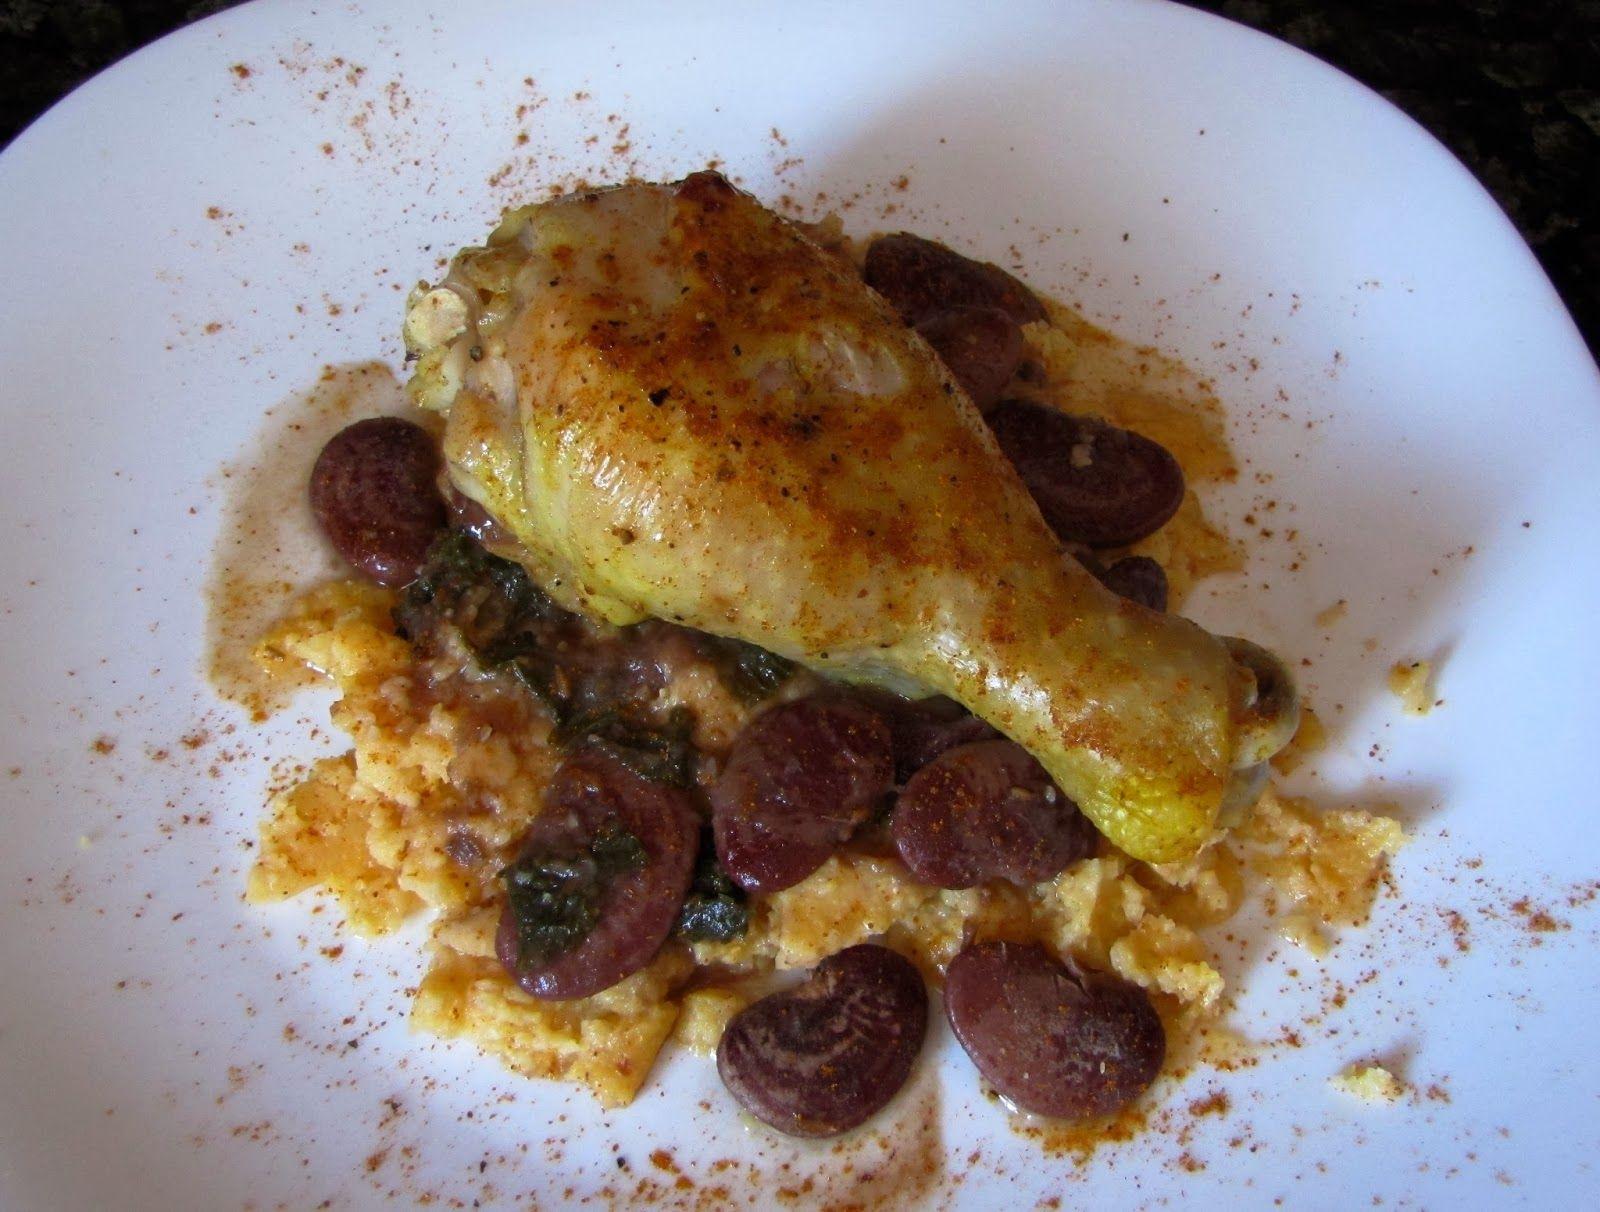 Spicy DC Blog: Easy Weeknight Dinner - Chermoula Buttermilk Roast...